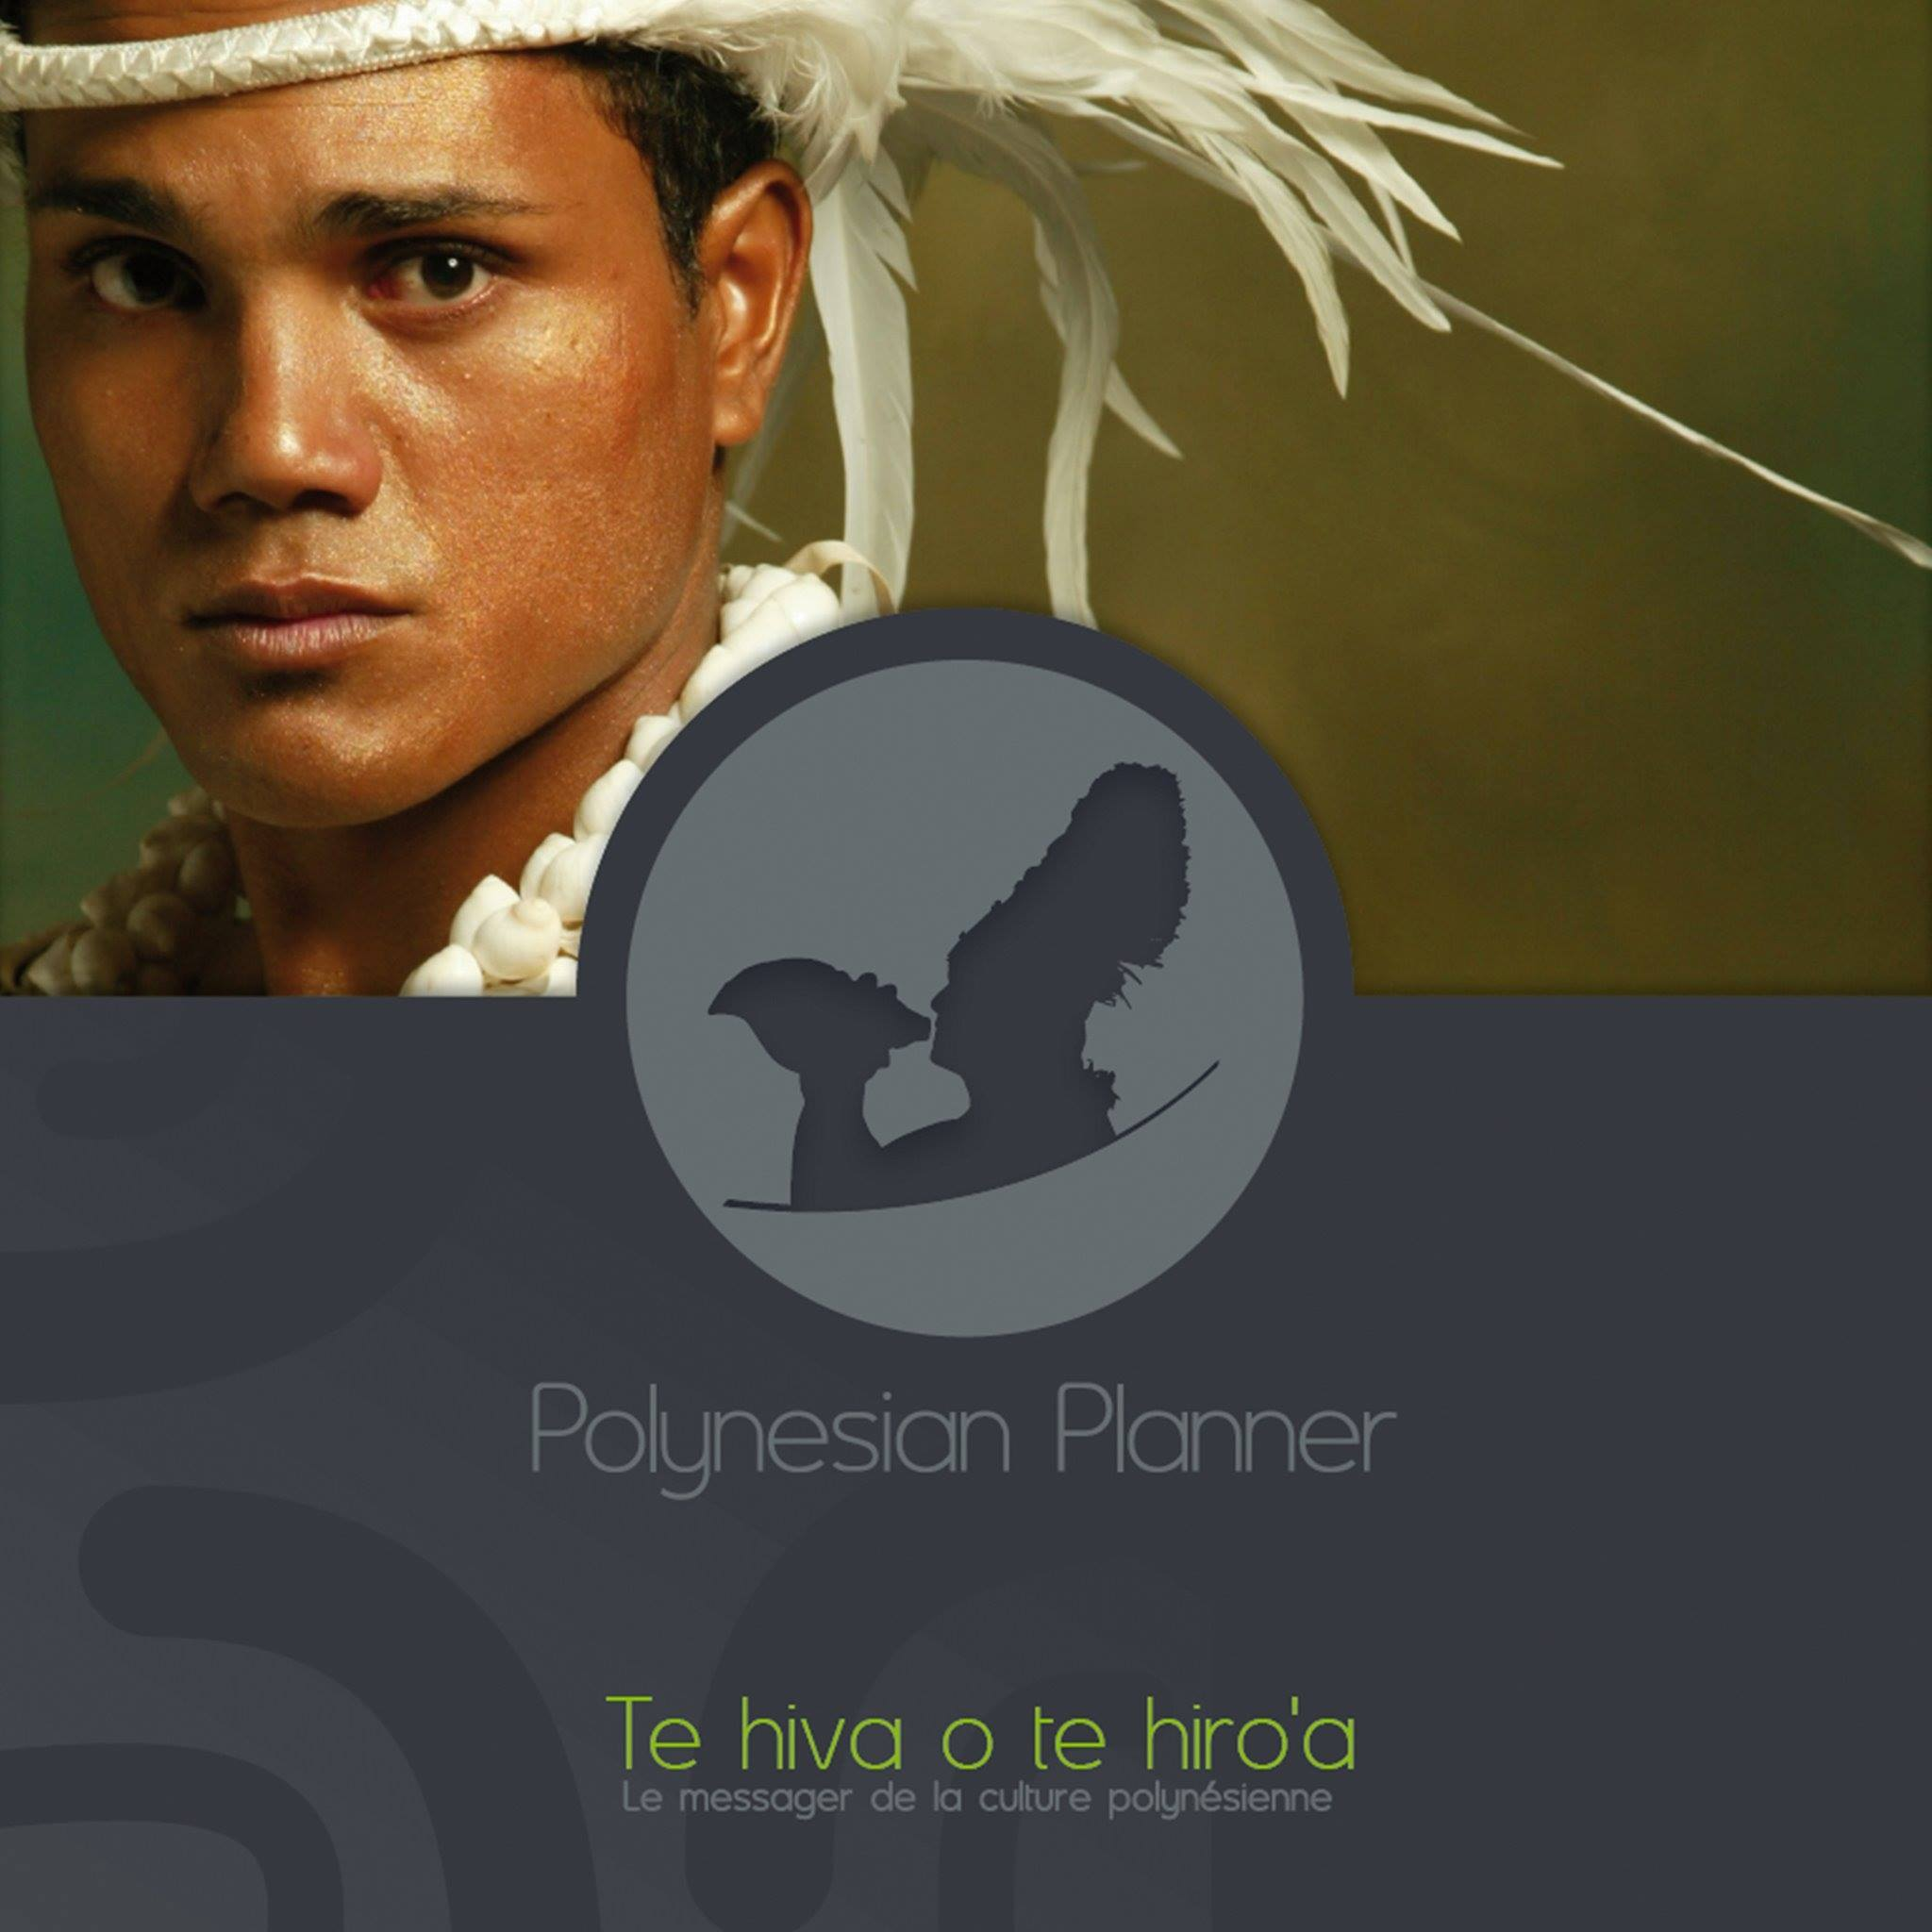 https://tahititourisme.kr/wp-content/uploads/2017/08/polynesianplannerphotodeprofil.jpg